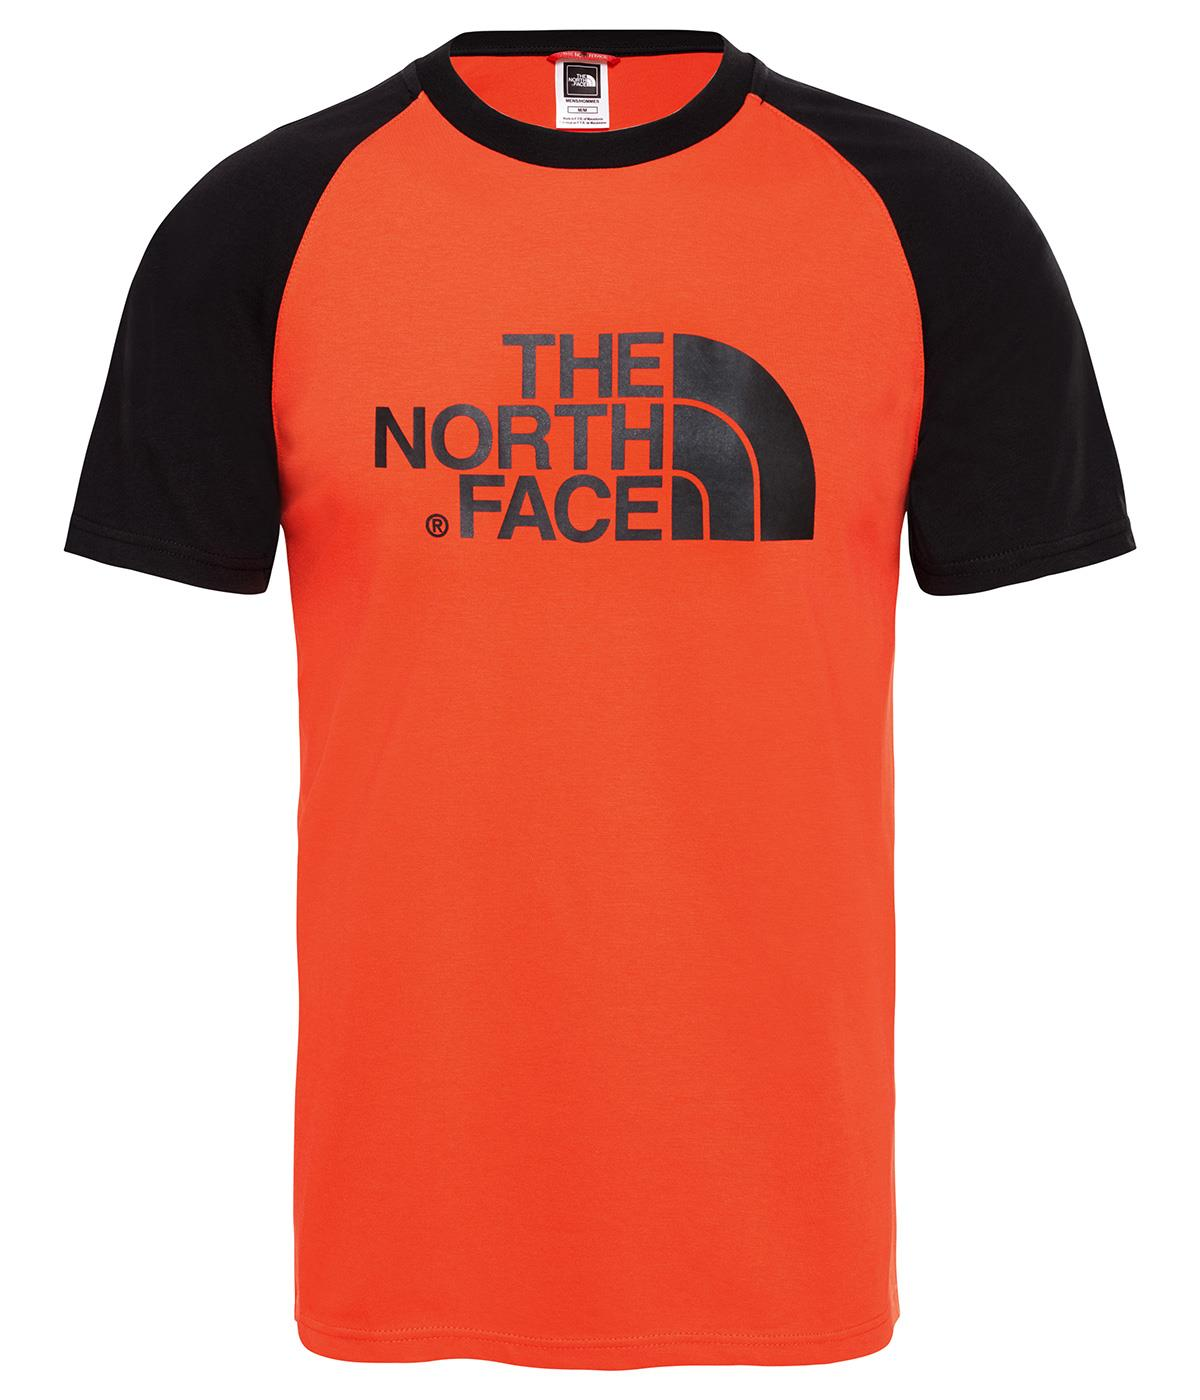 The Northface Erkek S/S Raglan Easy Tee - Eu T937Fv15Q Tişört